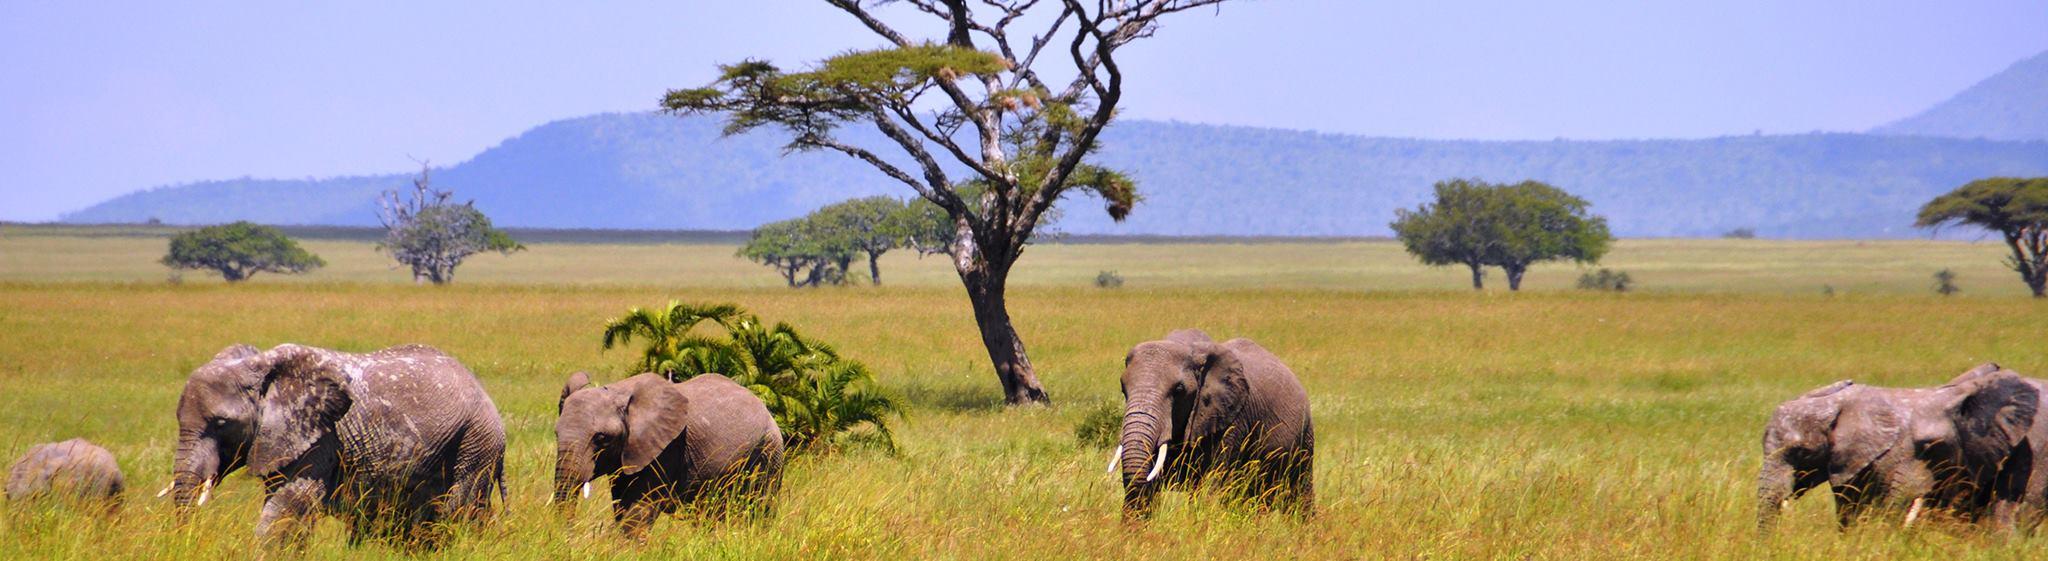 Tanzania Safaris and Beach Vacations - Safanta Tours & Travel Company Limited